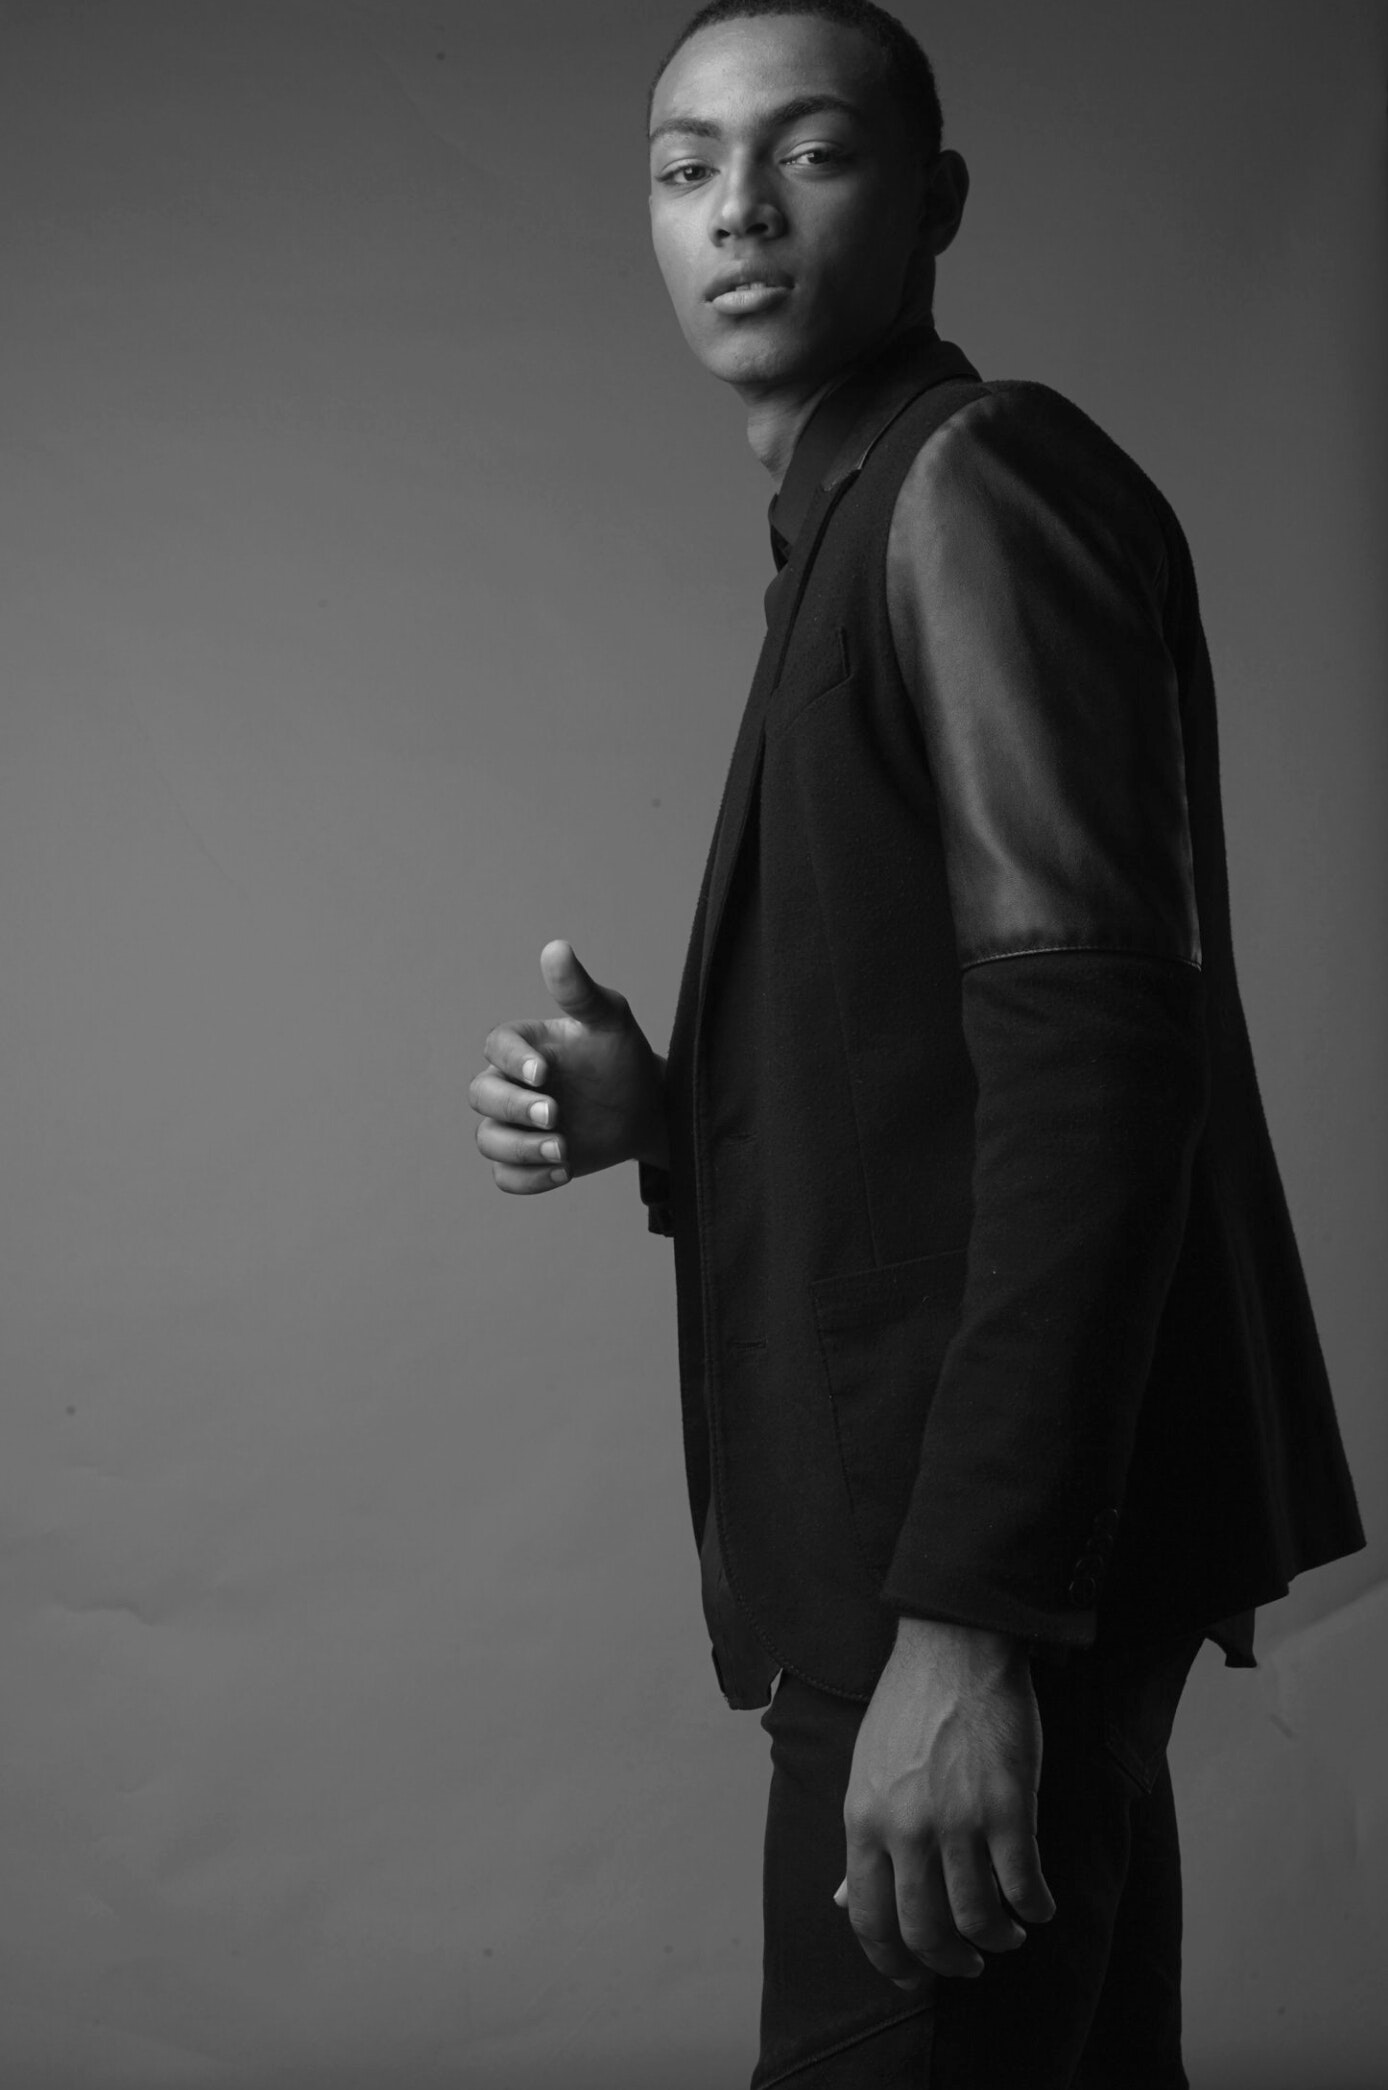 Christopher Cato's Model portfolio